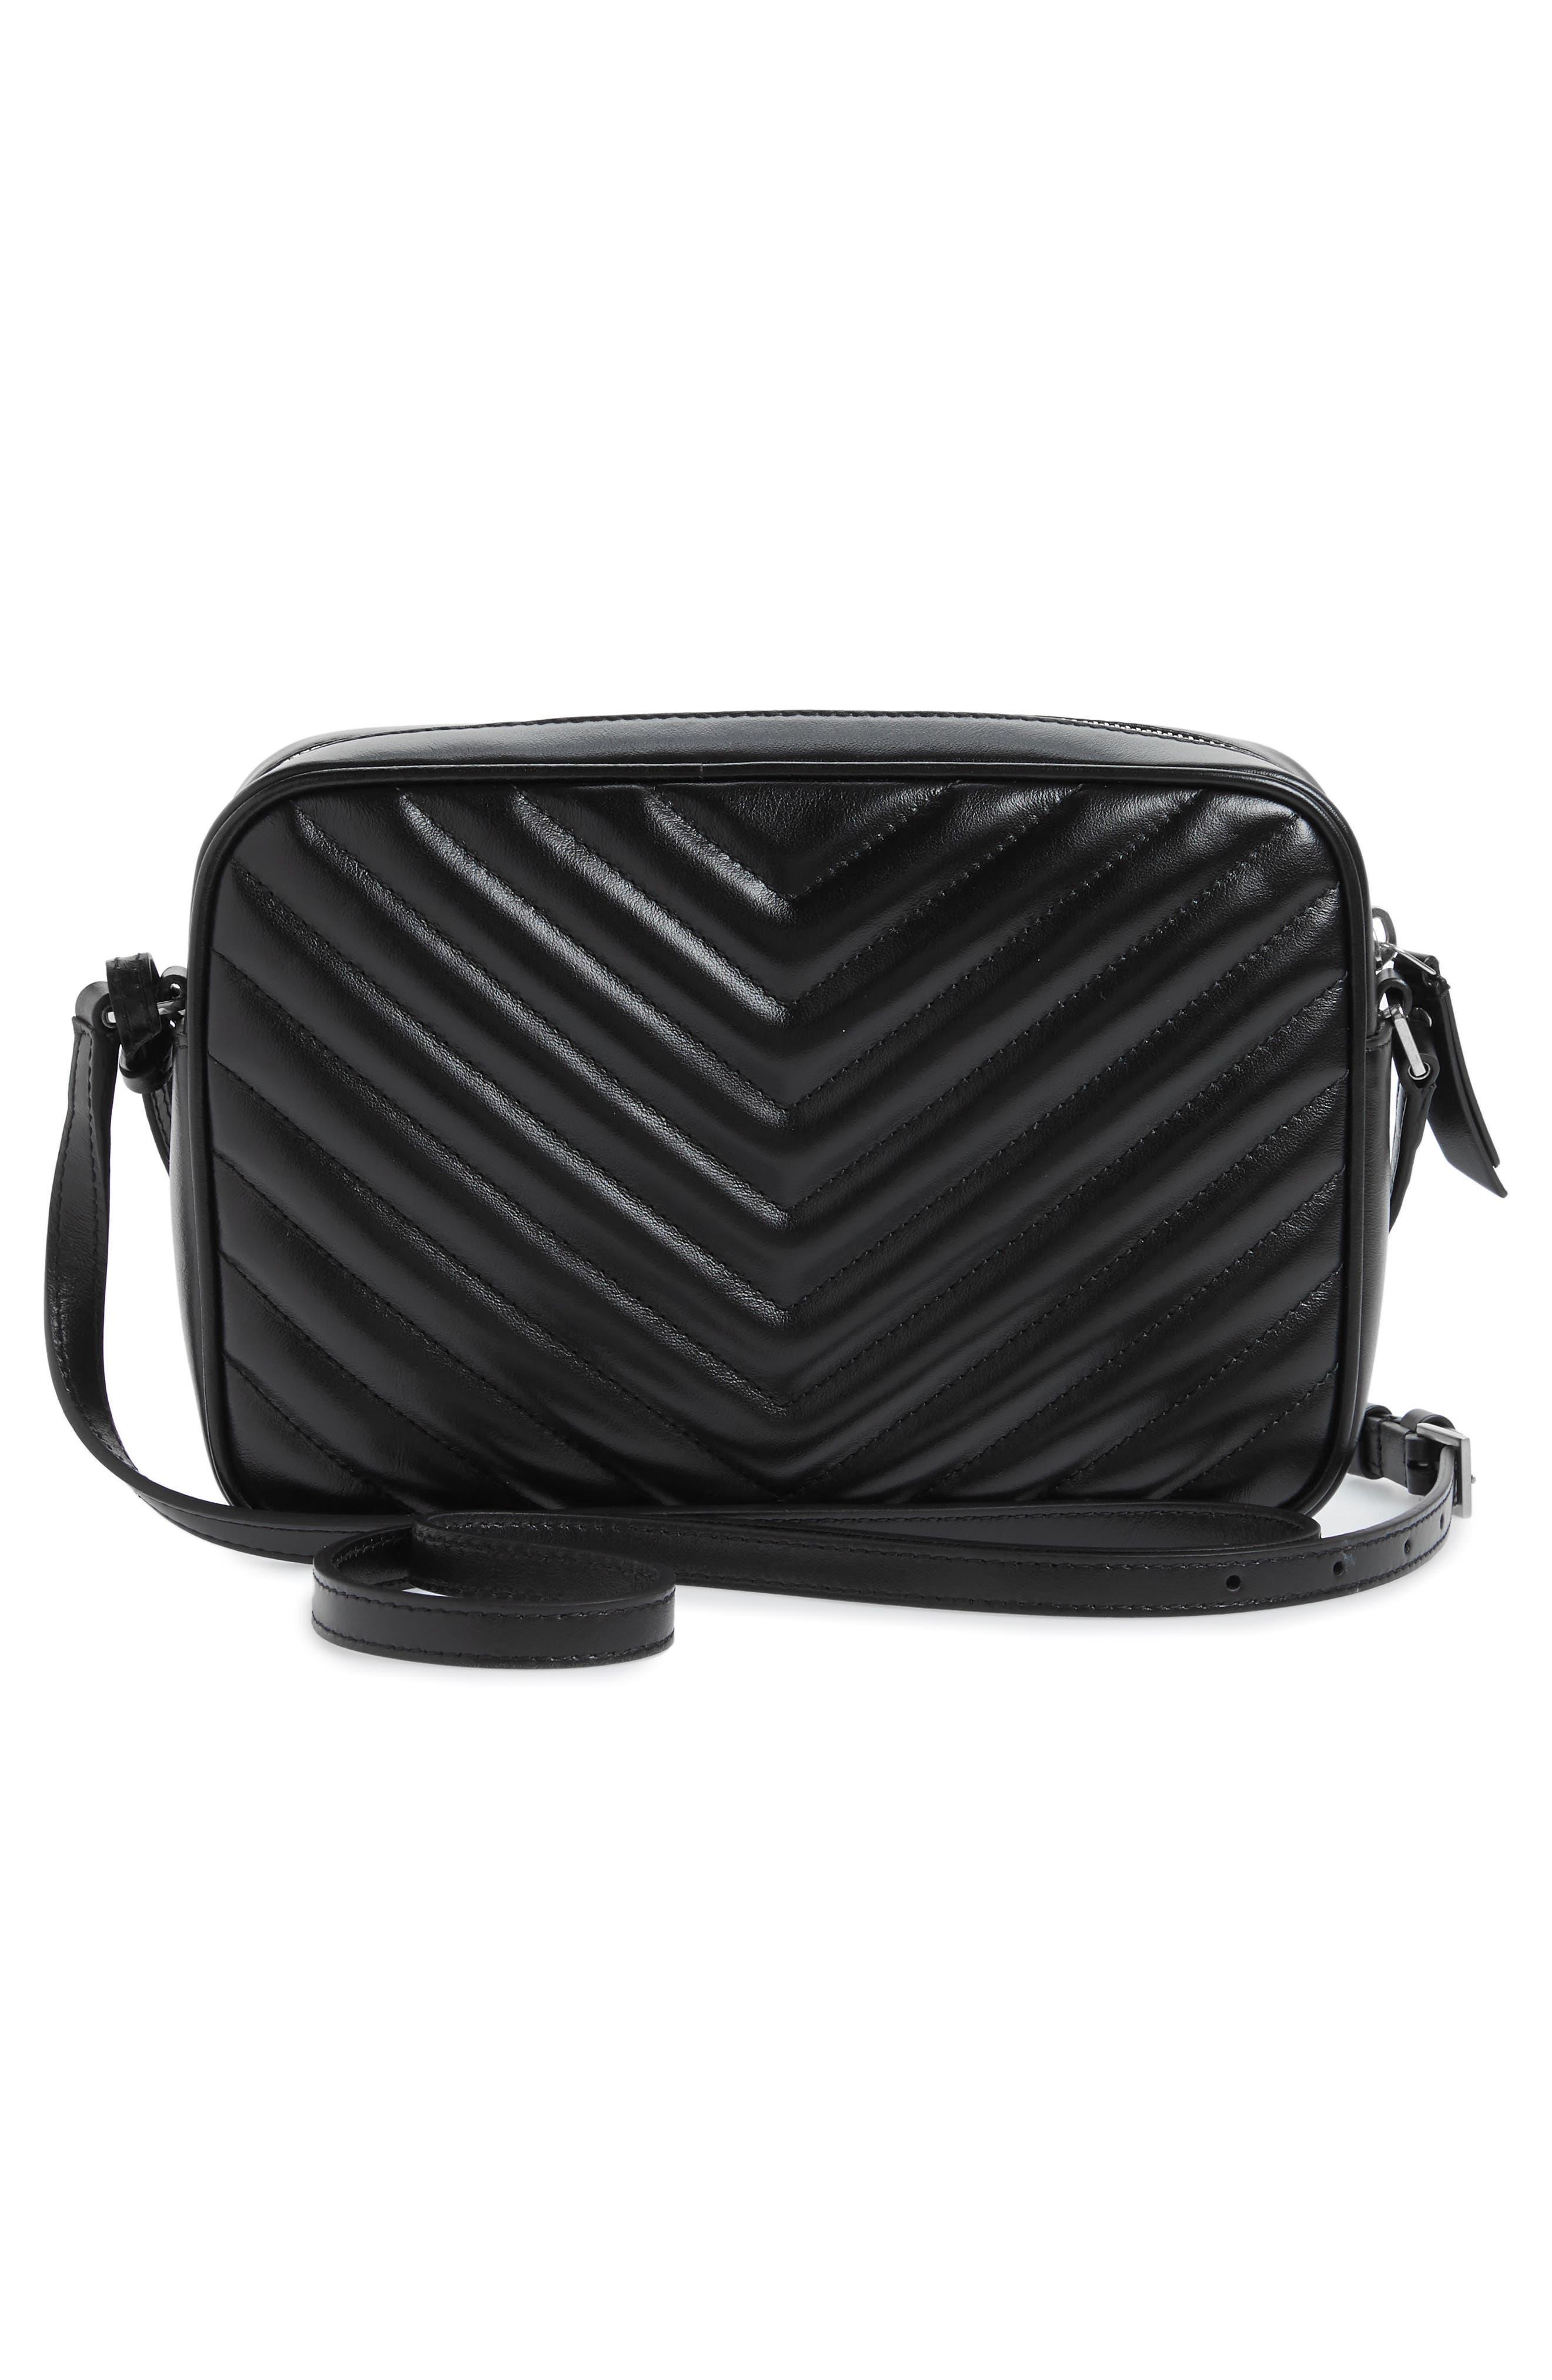 Medium Lou Calfskin Leather Camera Bag,                             Alternate thumbnail 3, color,                             001